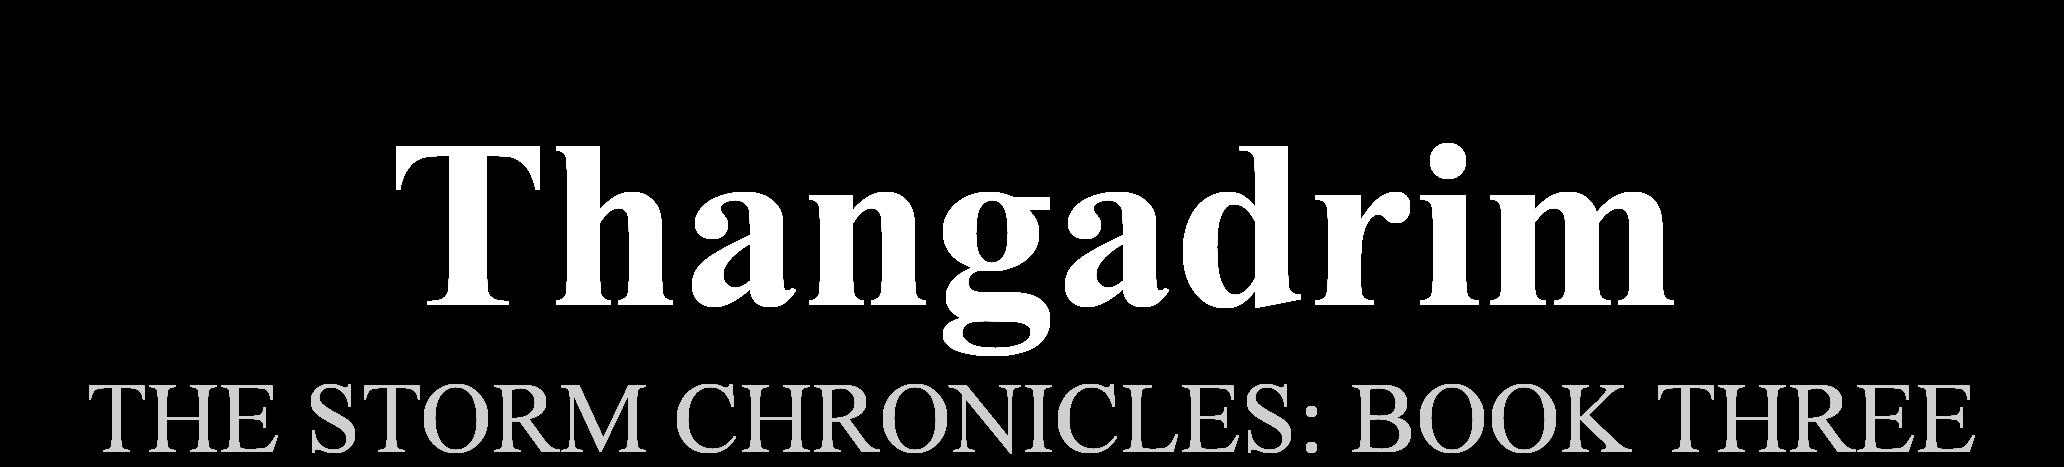 Universe of G-Minor - Thangadrim Title